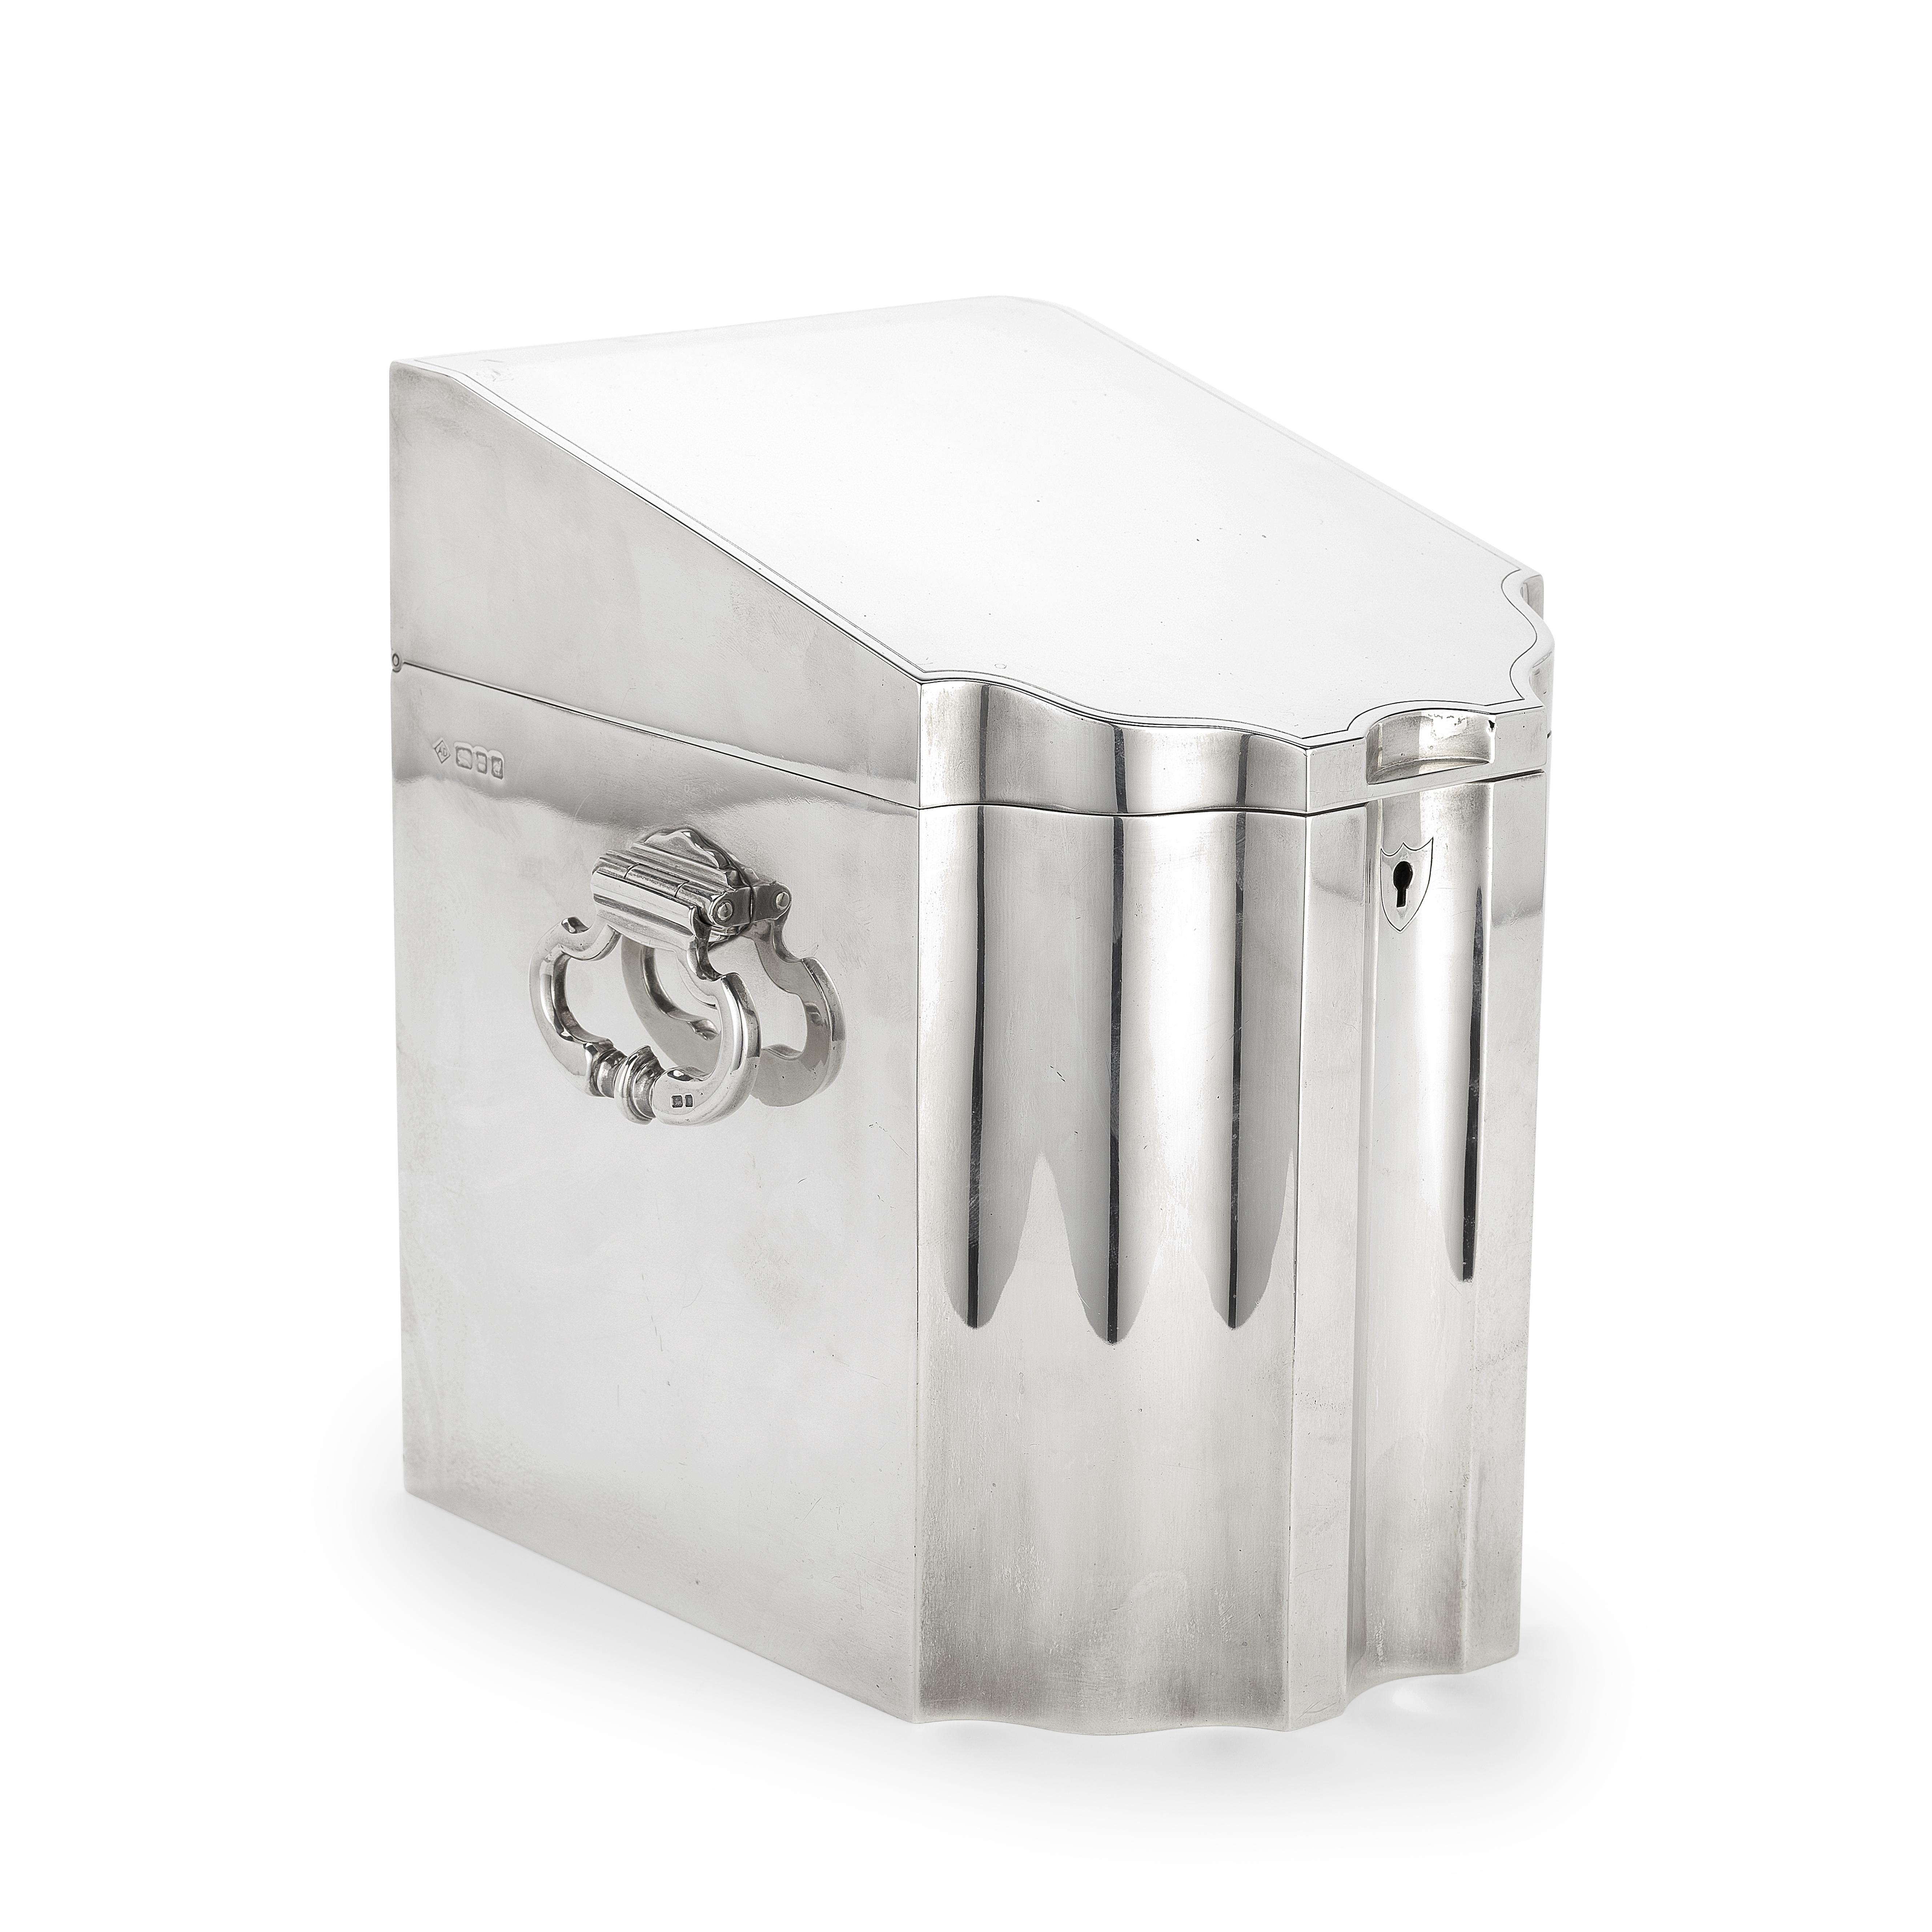 DUNHILL: a rare silver humidor Alfred Dunhill, London 1959